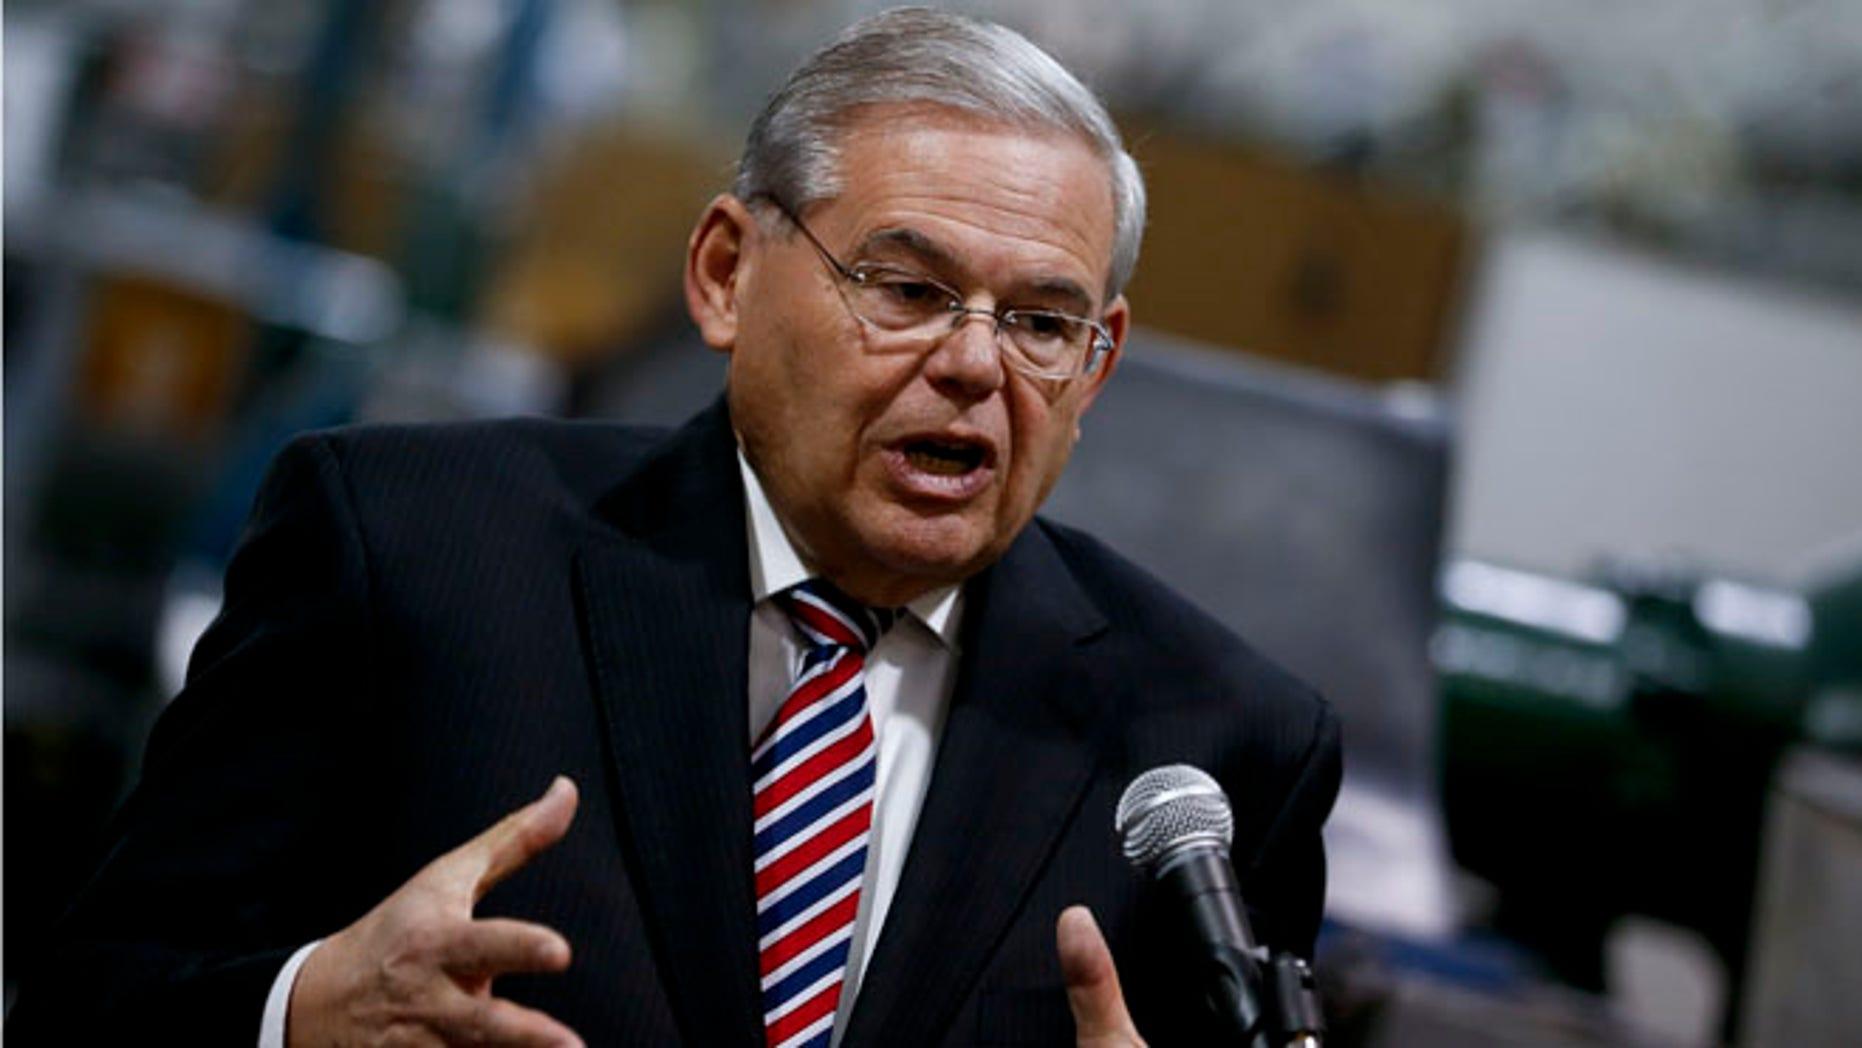 U.S. Sen. Robert Menendez on March 23, 2015 in Garwood, New Jersey.